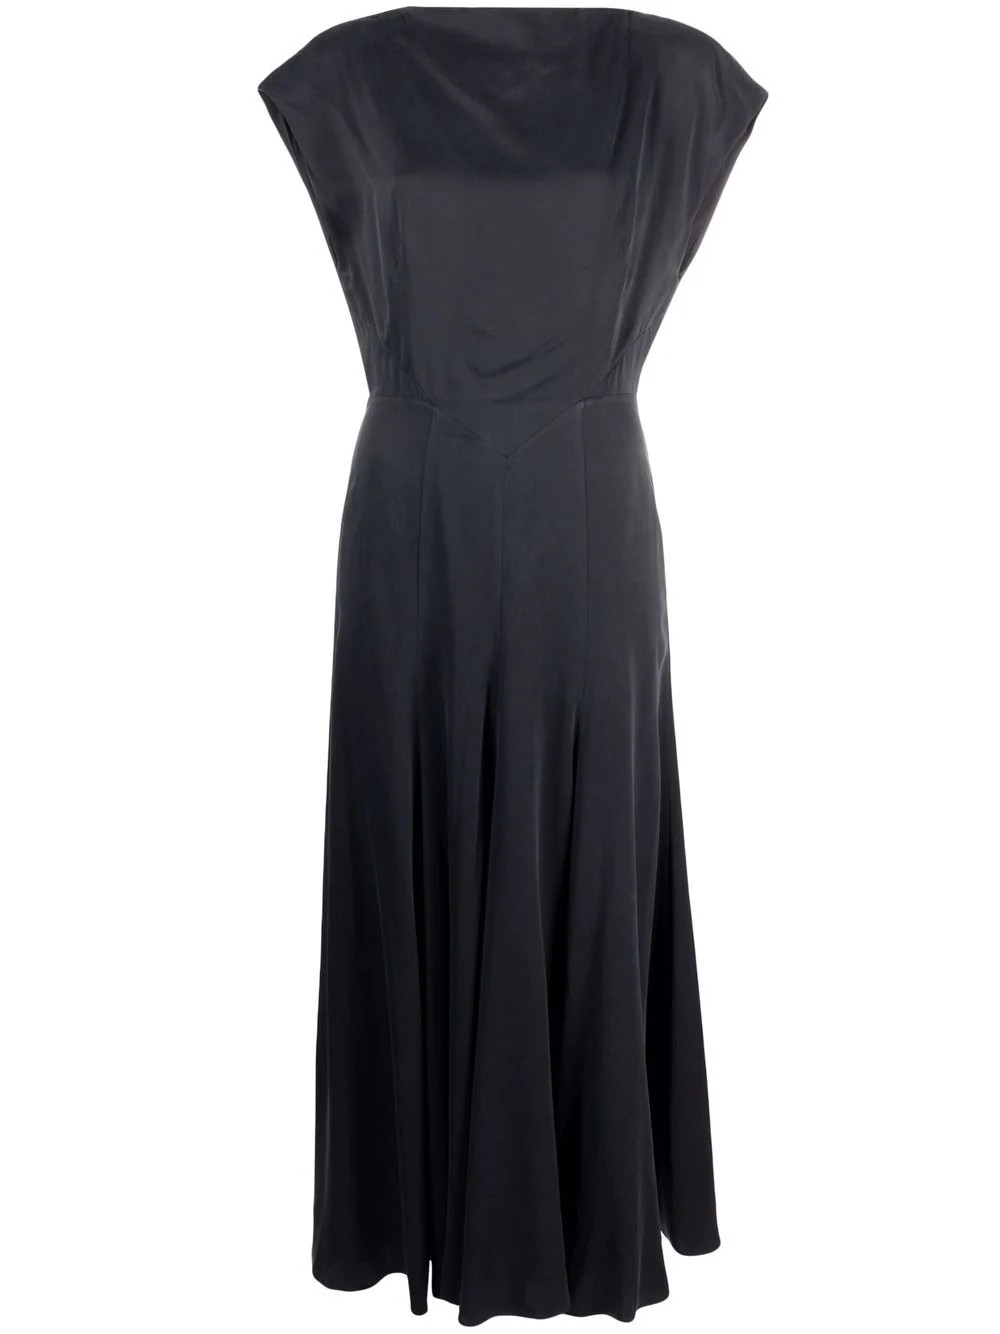 MARLOE DRESS